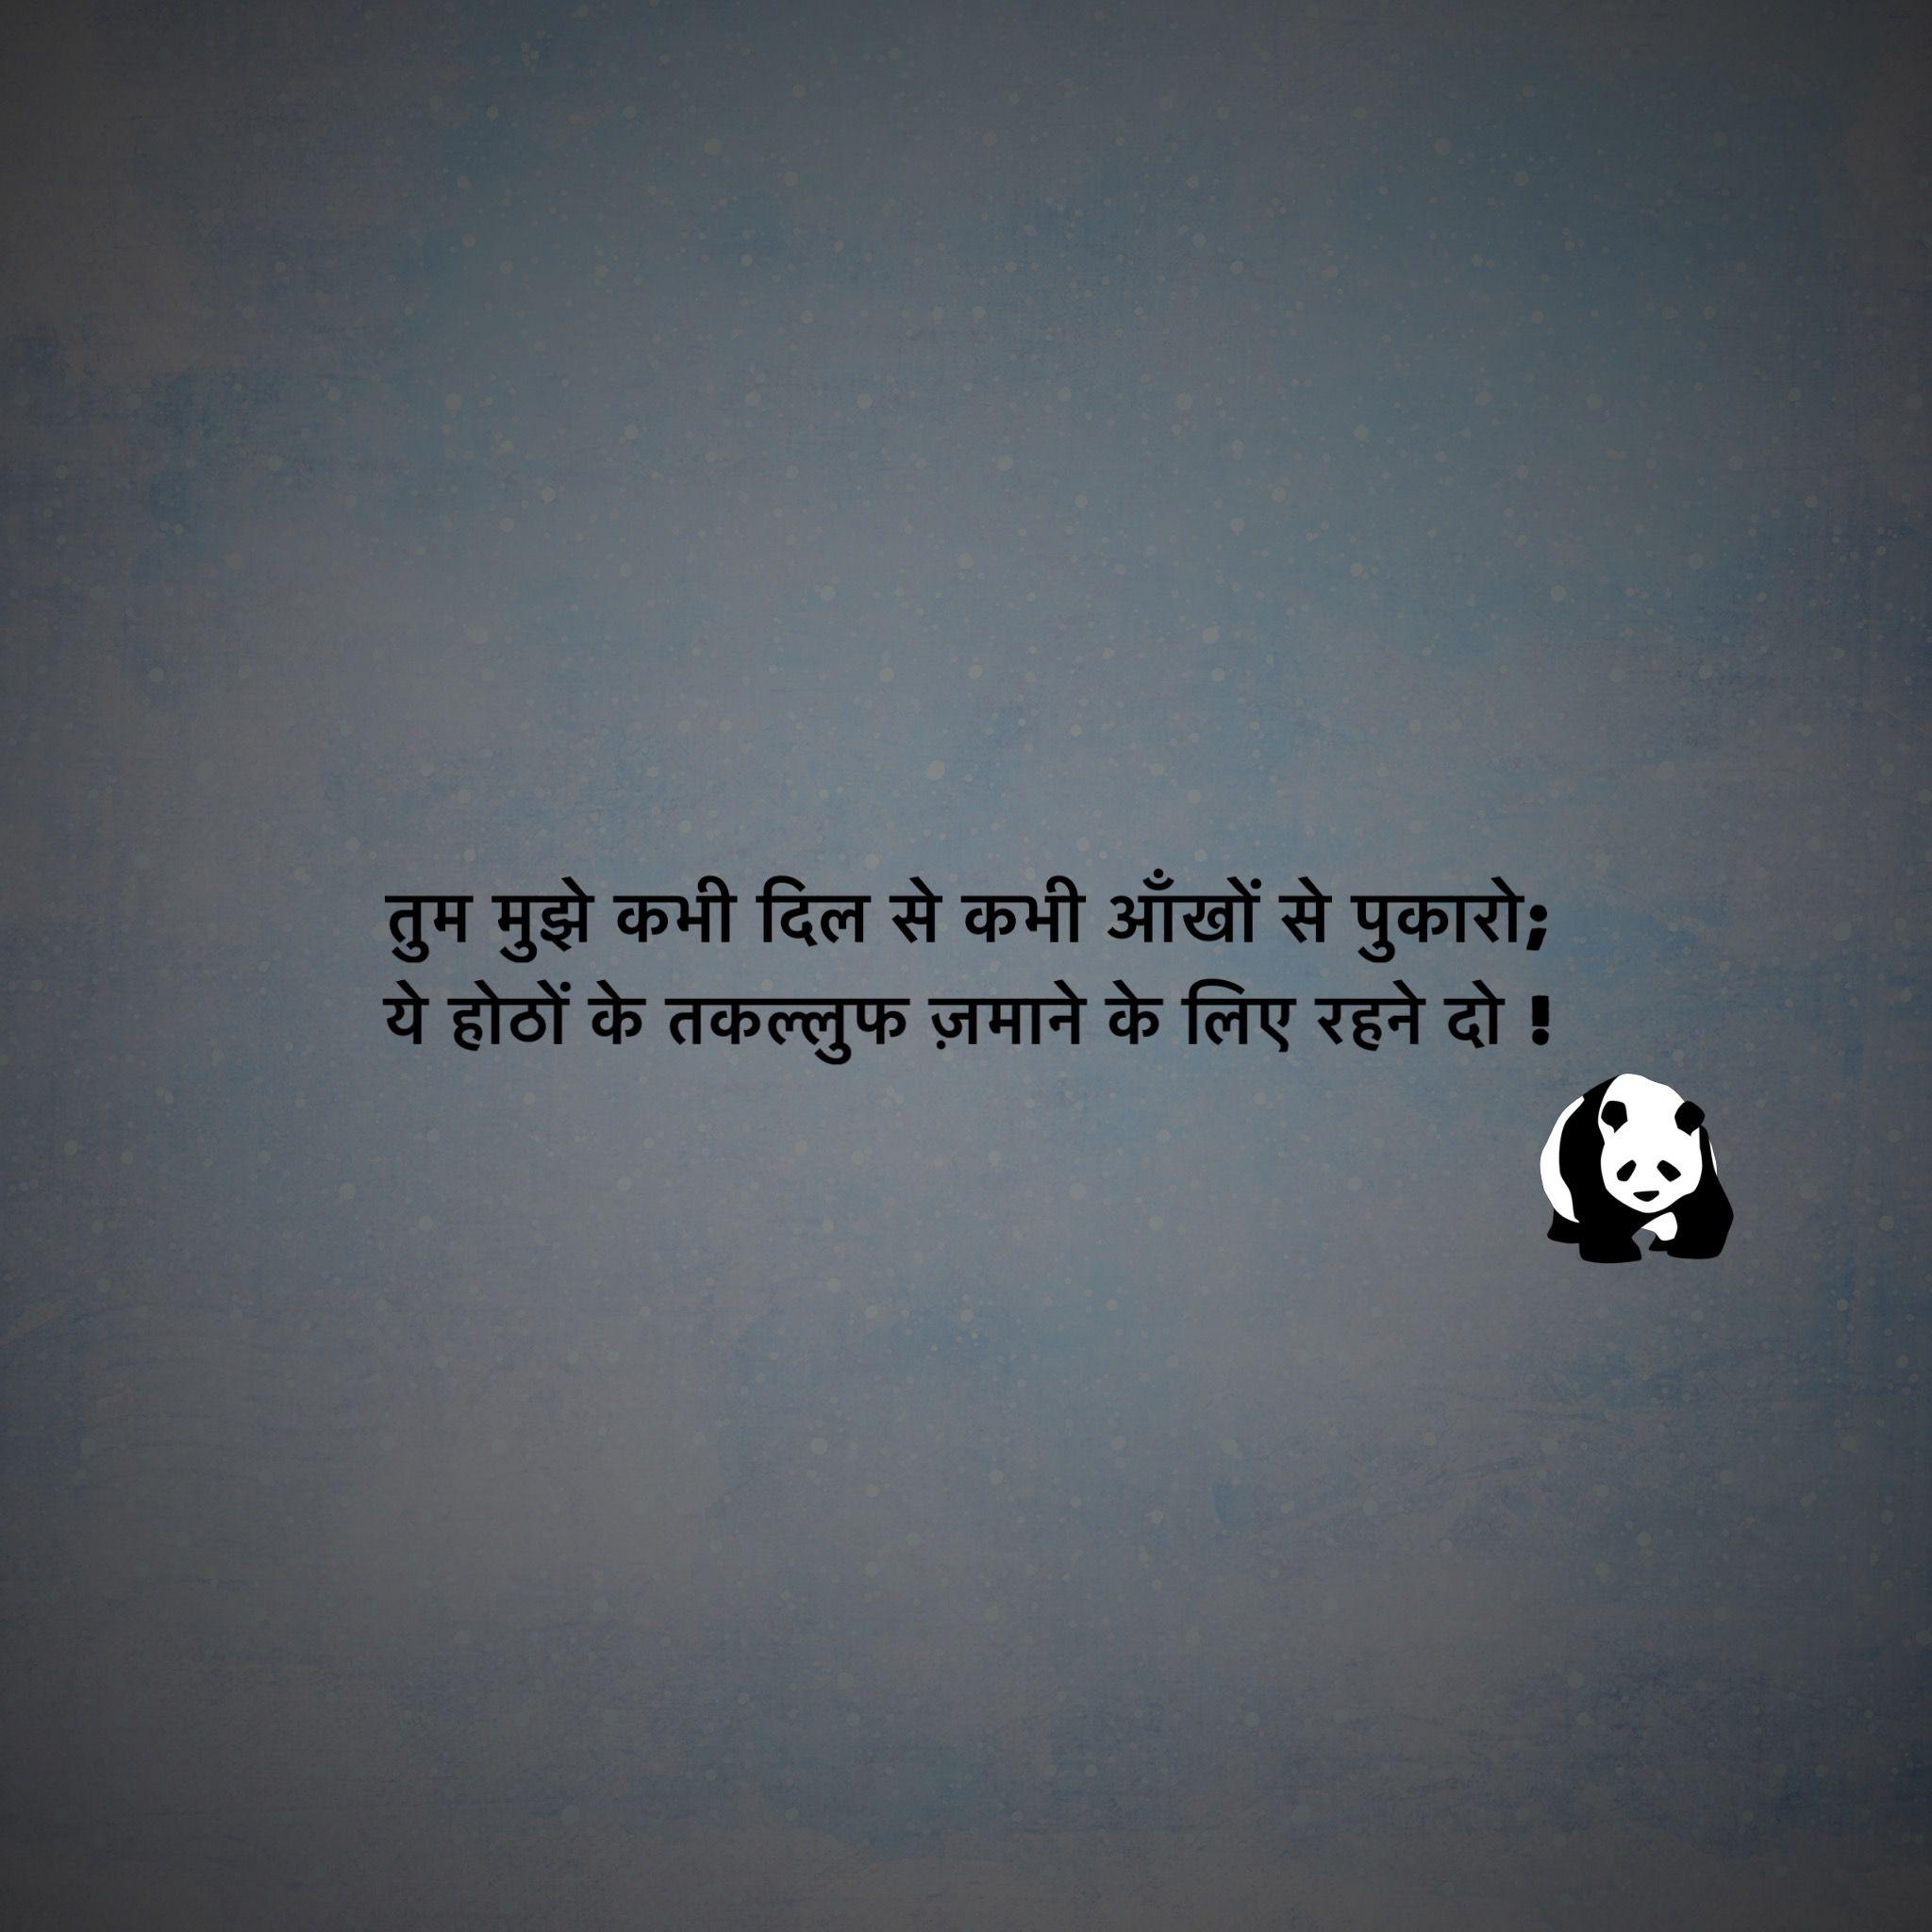 Hindi Quotes Urdu Shayri Writer Friendship Feelings